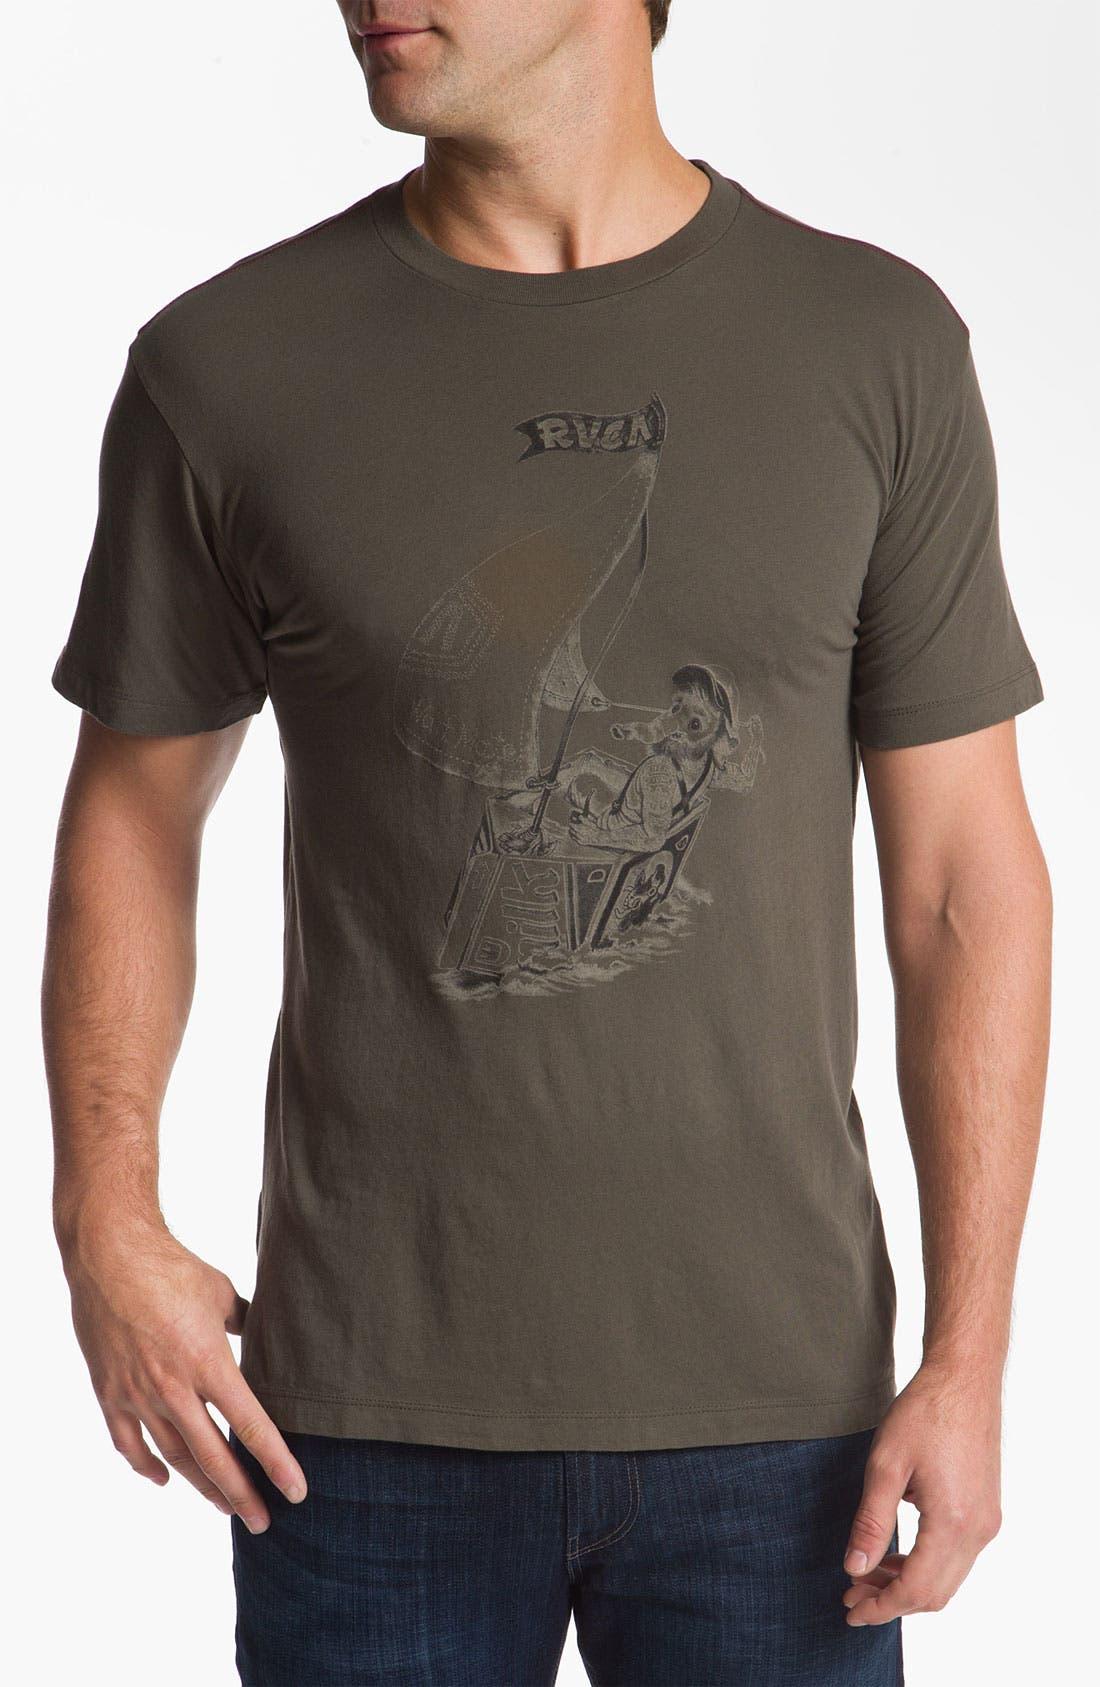 Alternate Image 1 Selected - RVCA 'Waff Mate' Vintage Wash T-Shirt